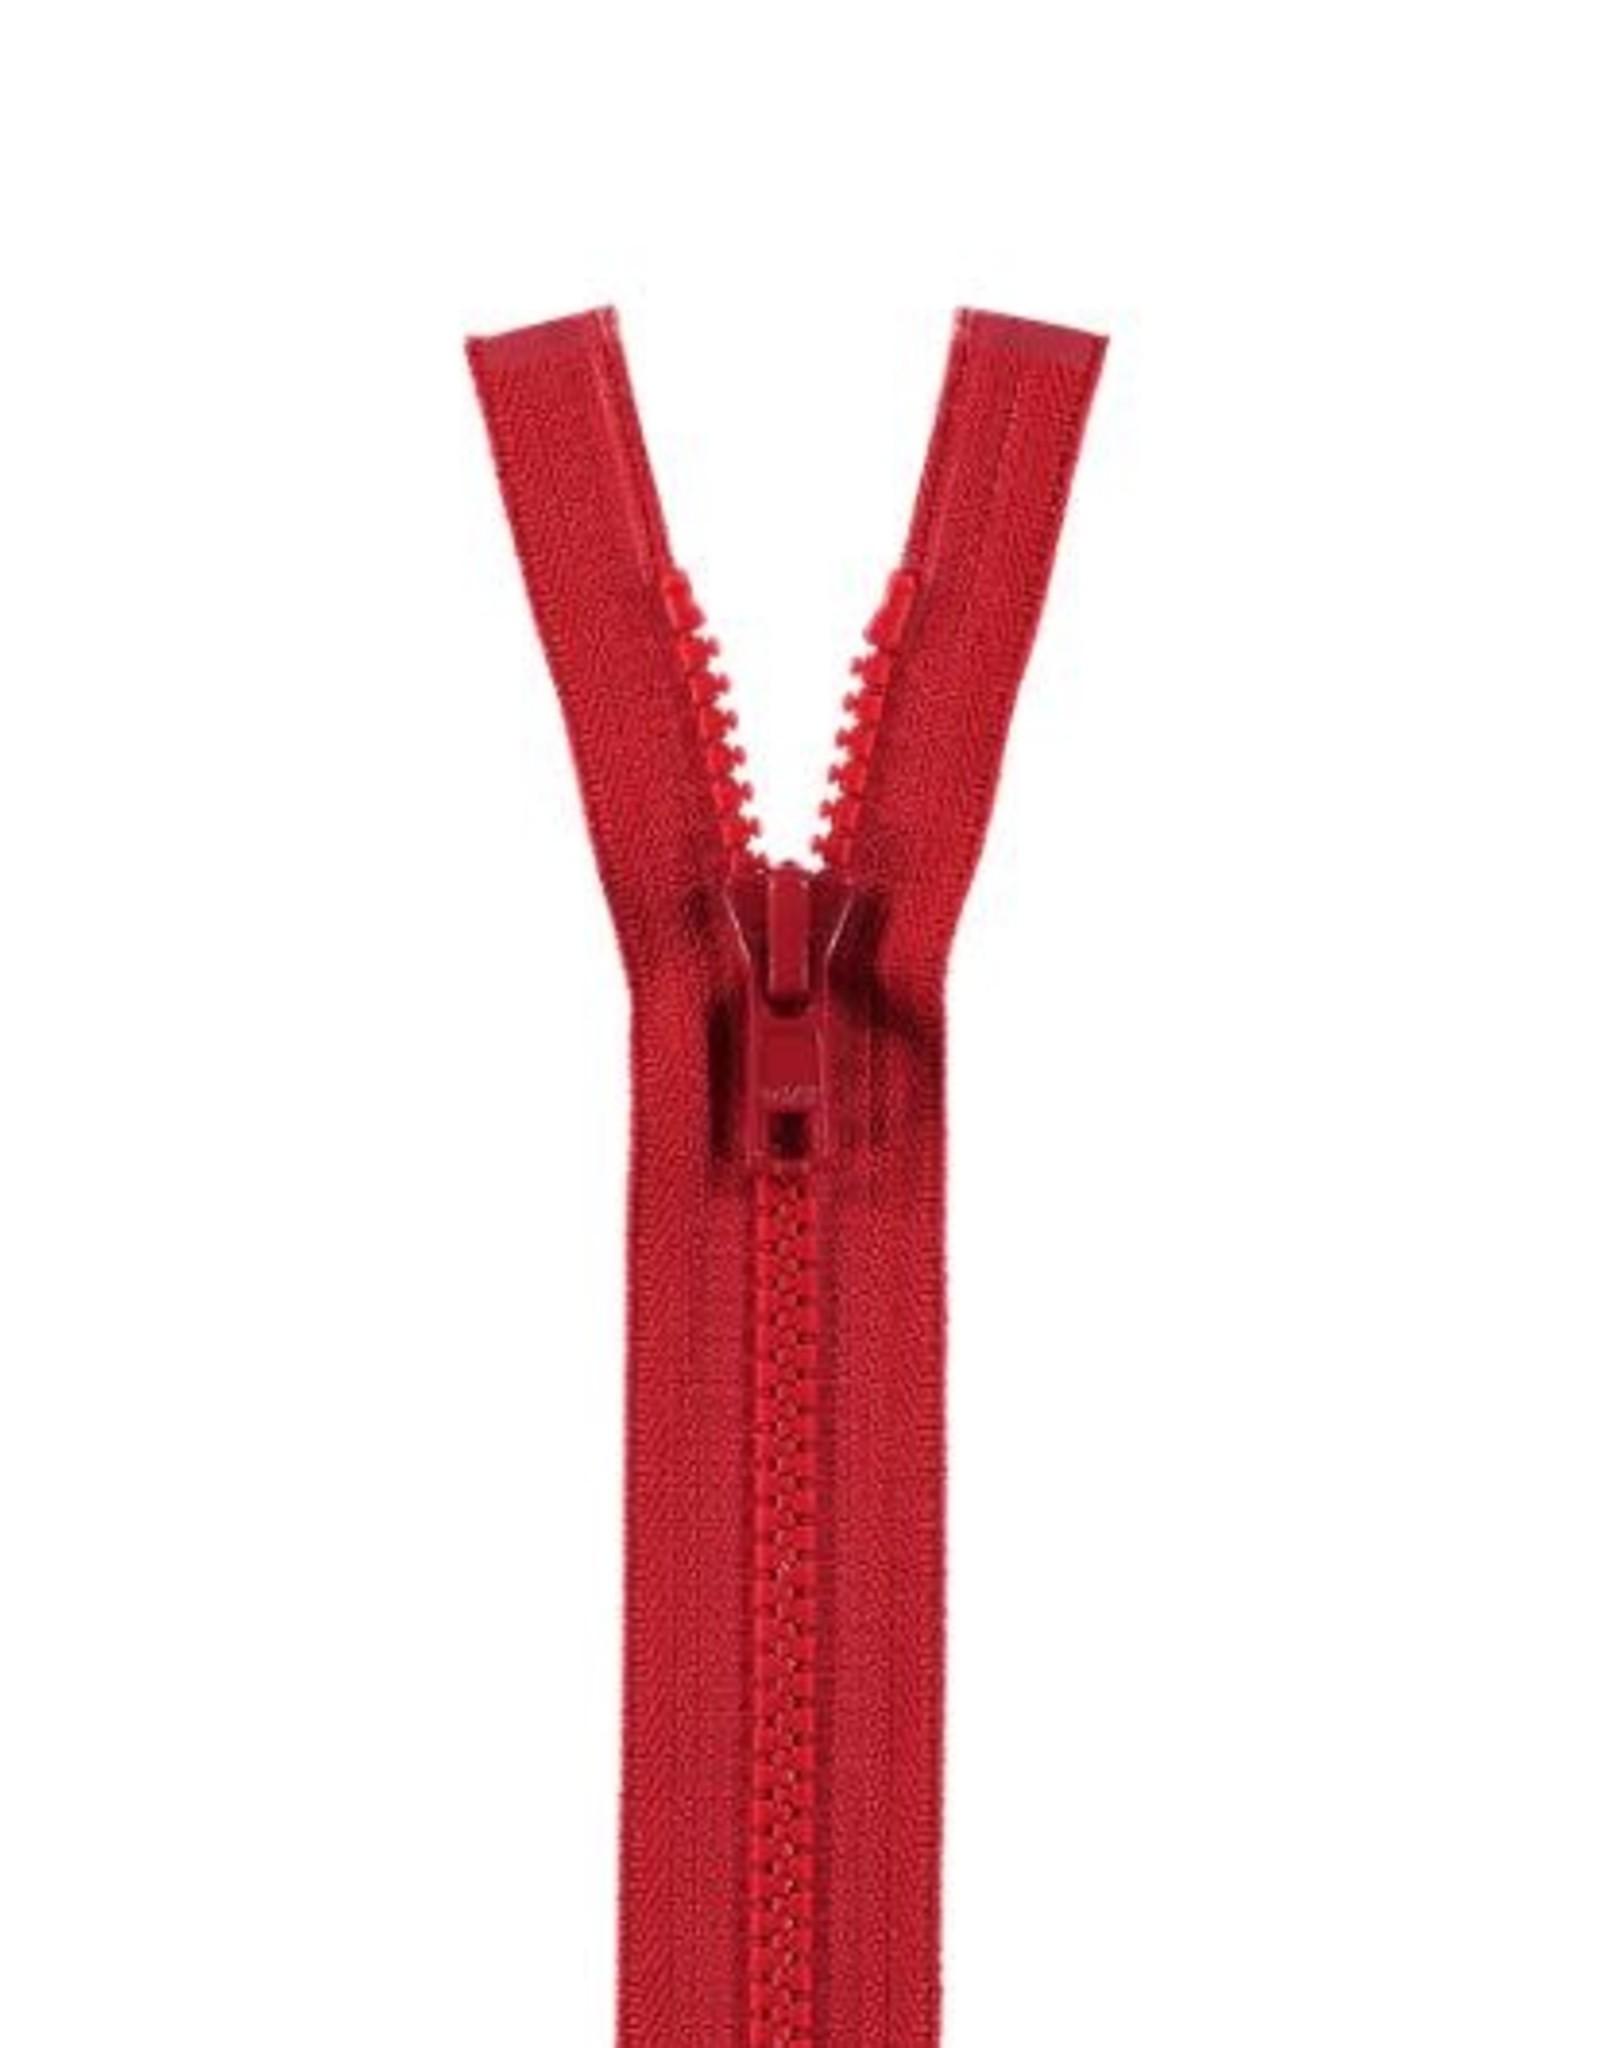 YKK BLOKRITS 5 DEELBAAR rood 519-30cm